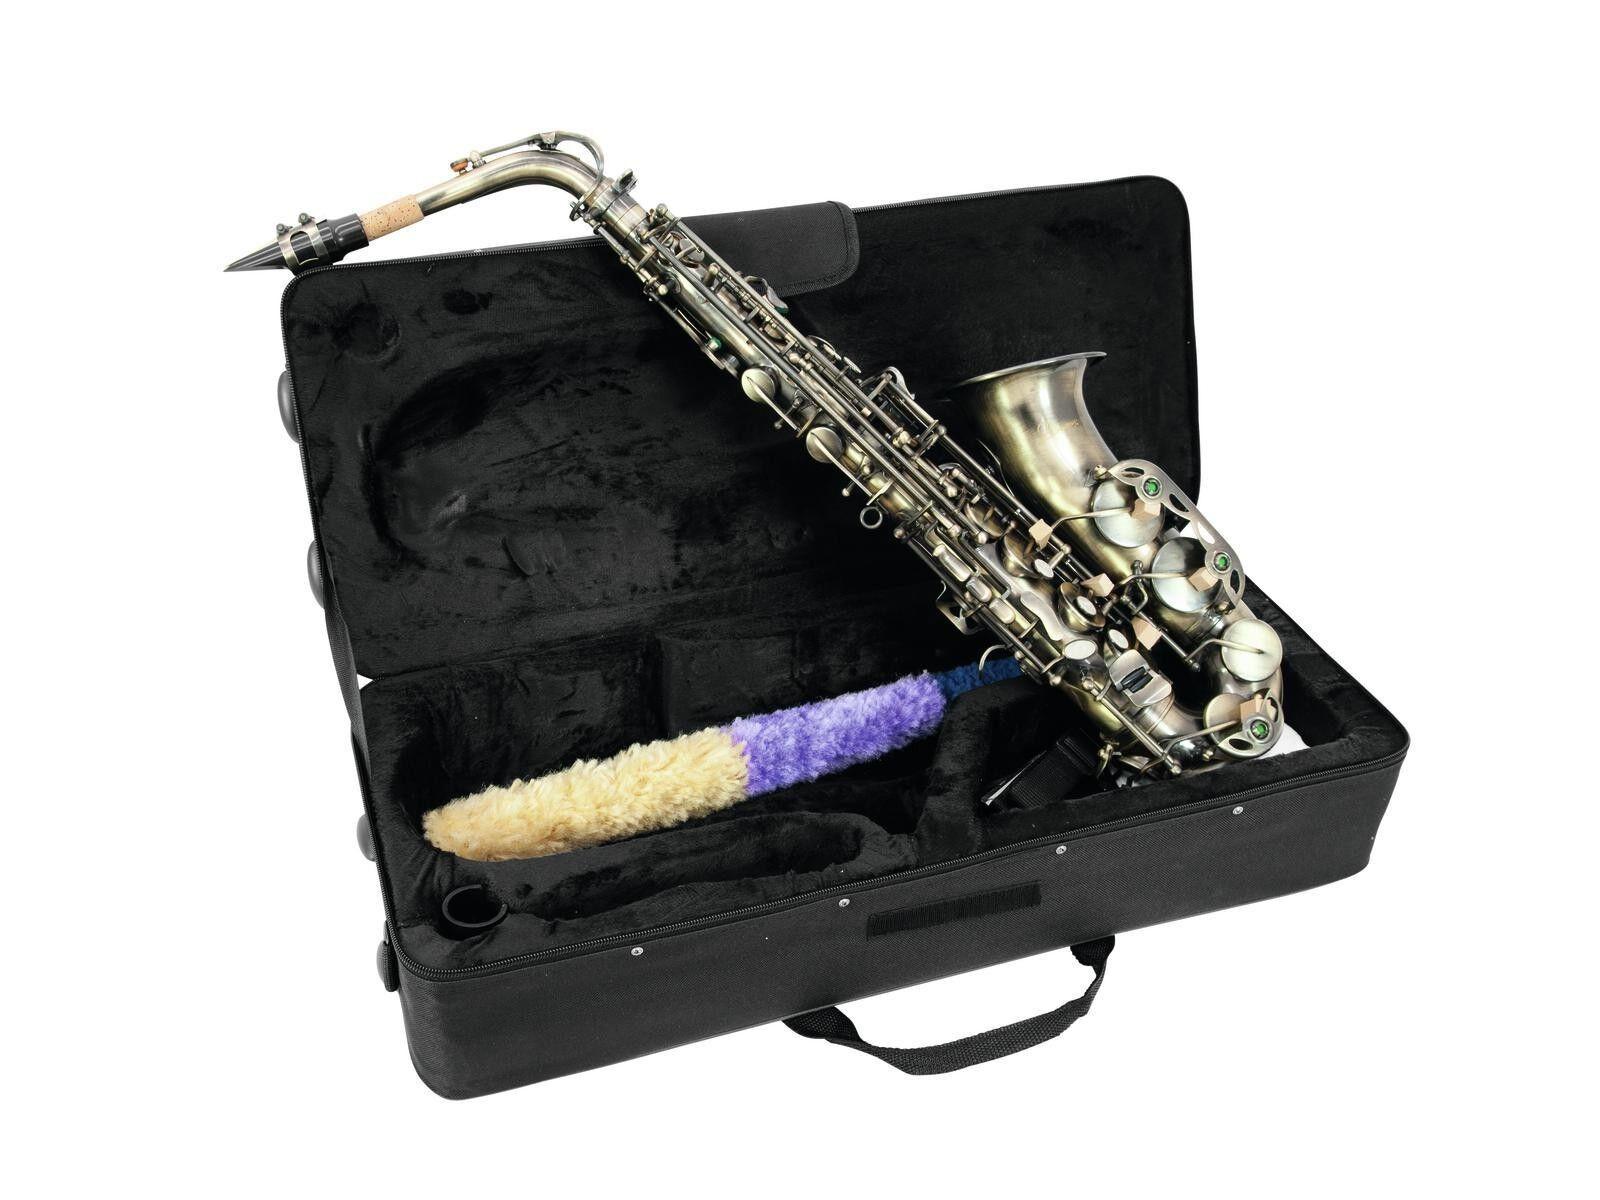 DIMAVERY SP-30 Eb Altsaxophon vintage Edles Altsaxophon in gebürsteter Optik